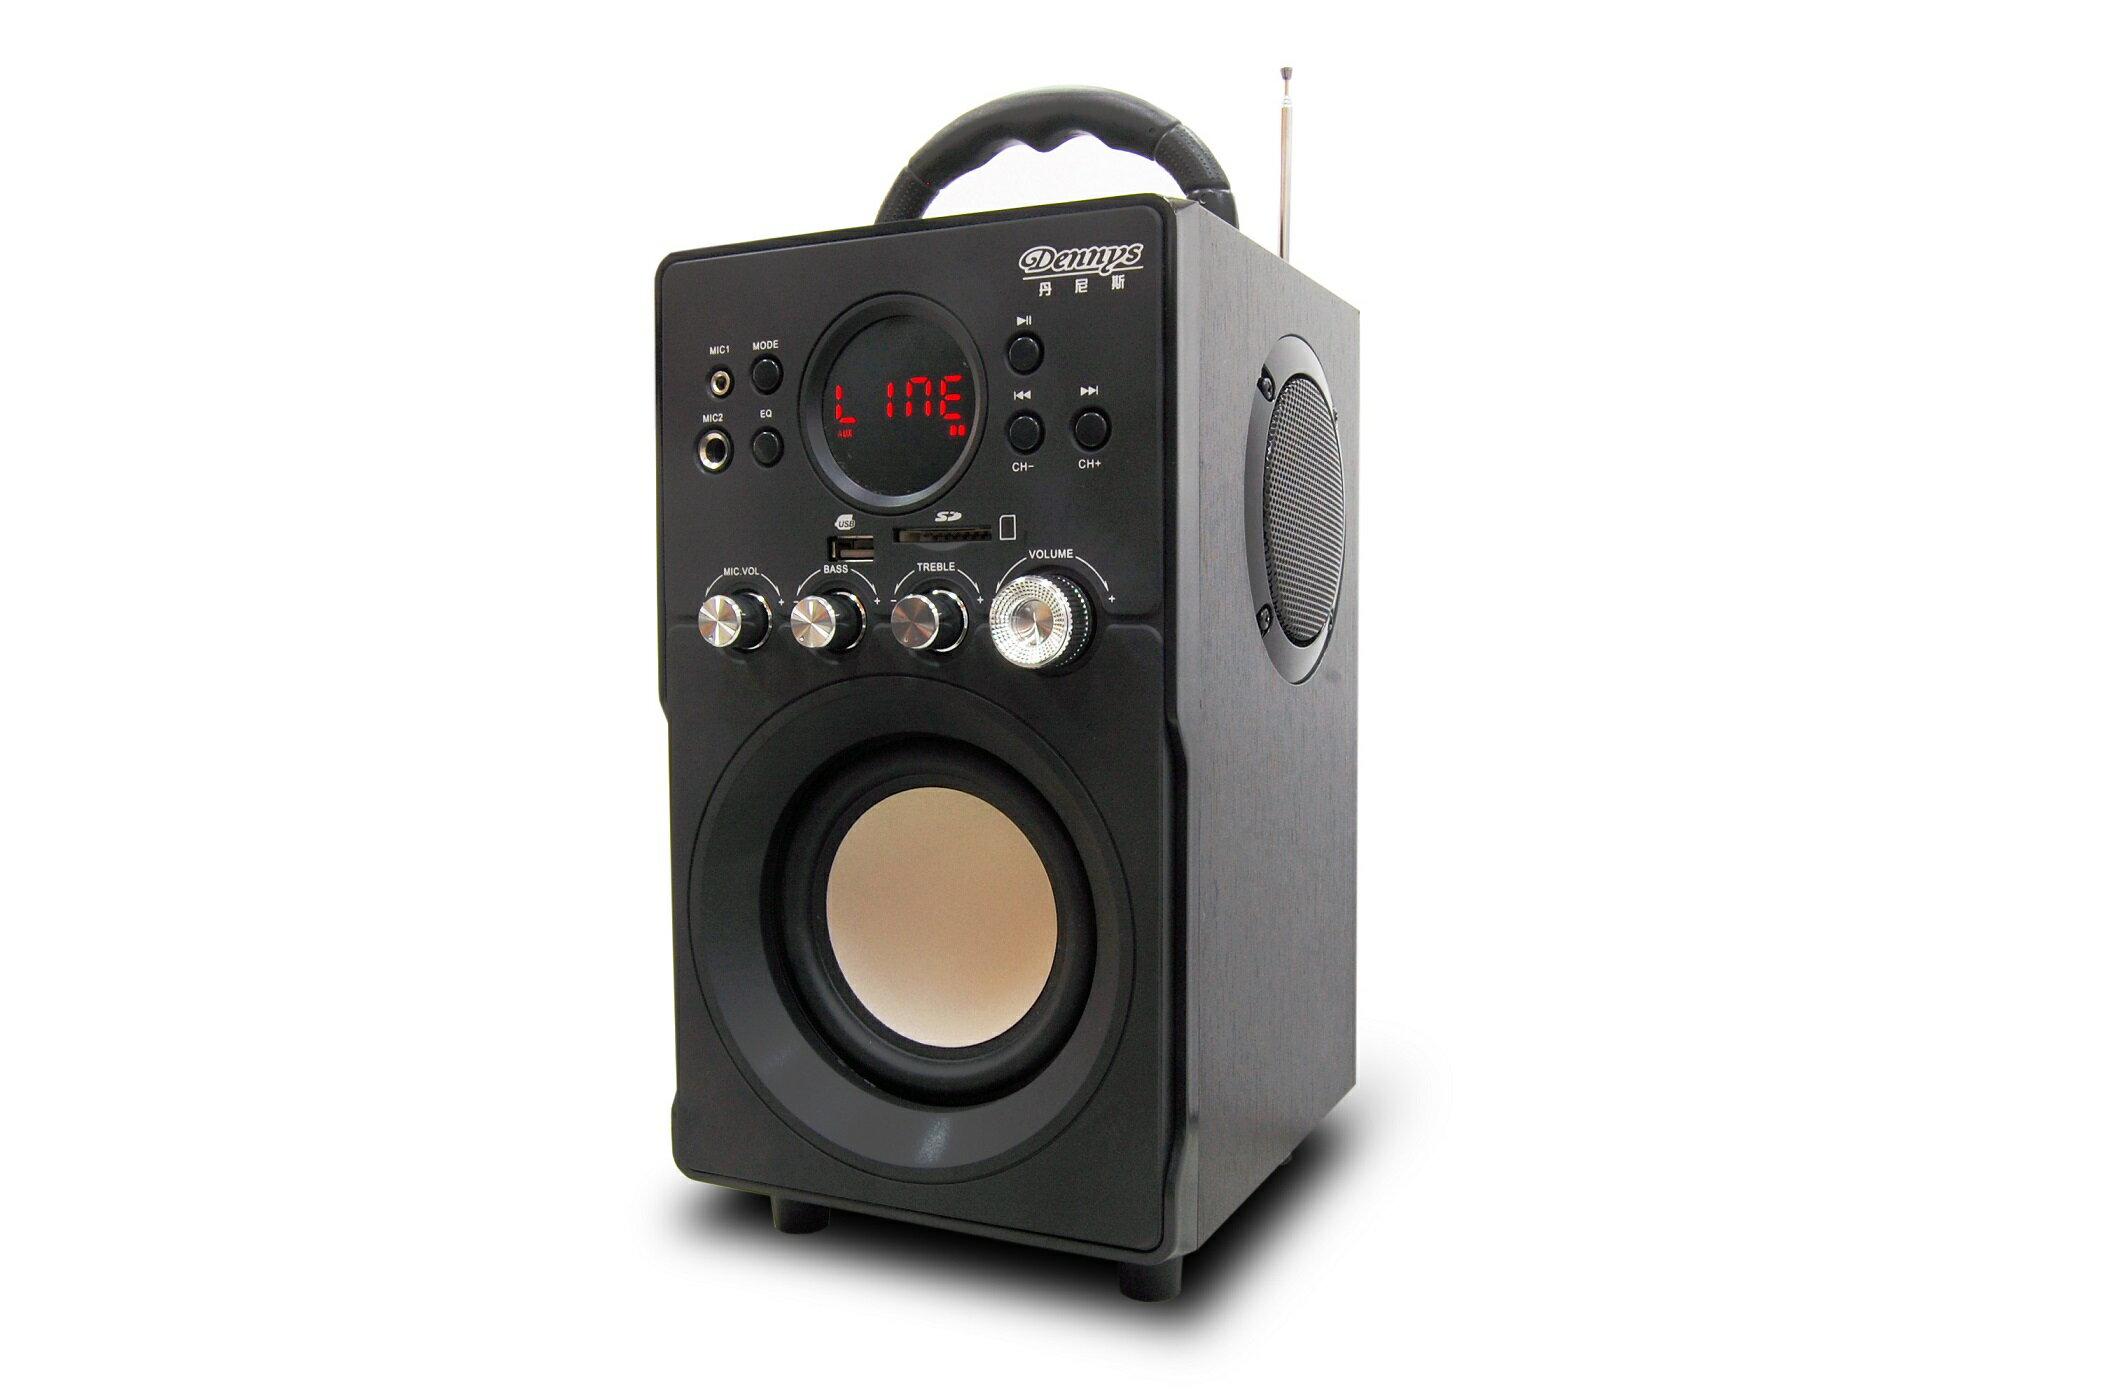 Dennys】迷你2.1多媒體重低音MP3音響(WS-330)